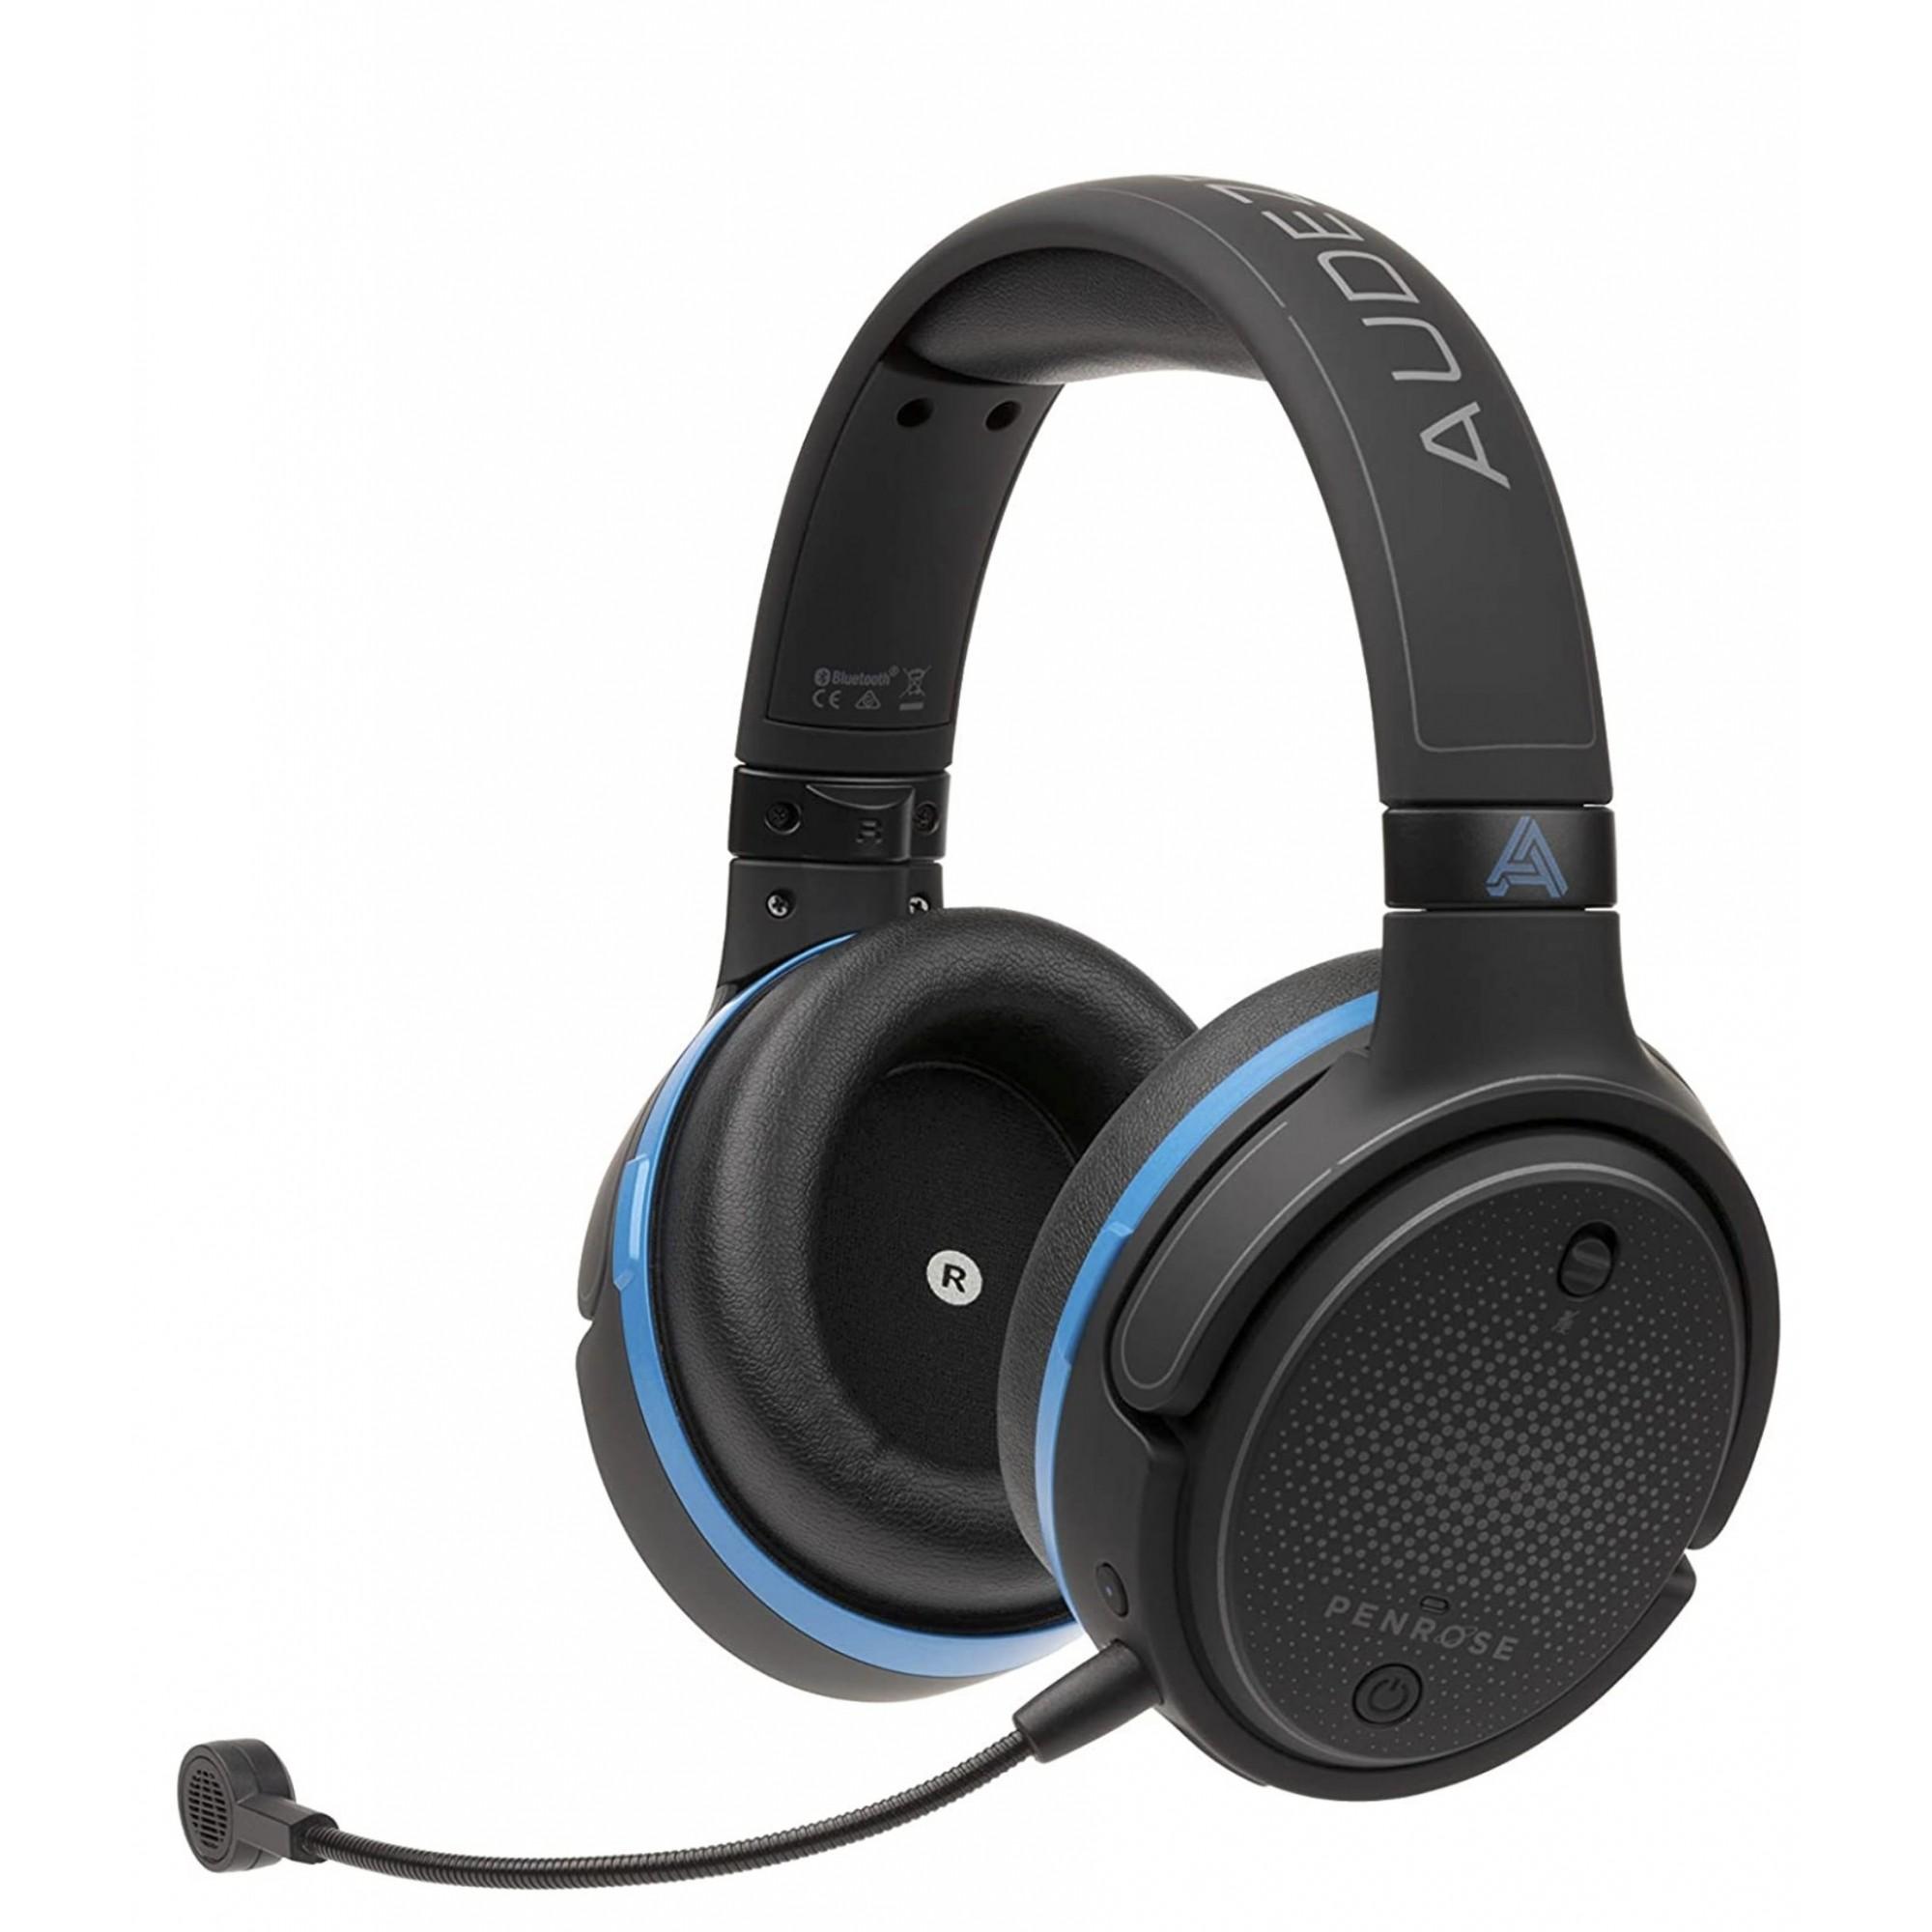 Fone De Ouvido Gamer Audeze Penrose Wireless Gaming Headset for PS5, Windows e  Mac